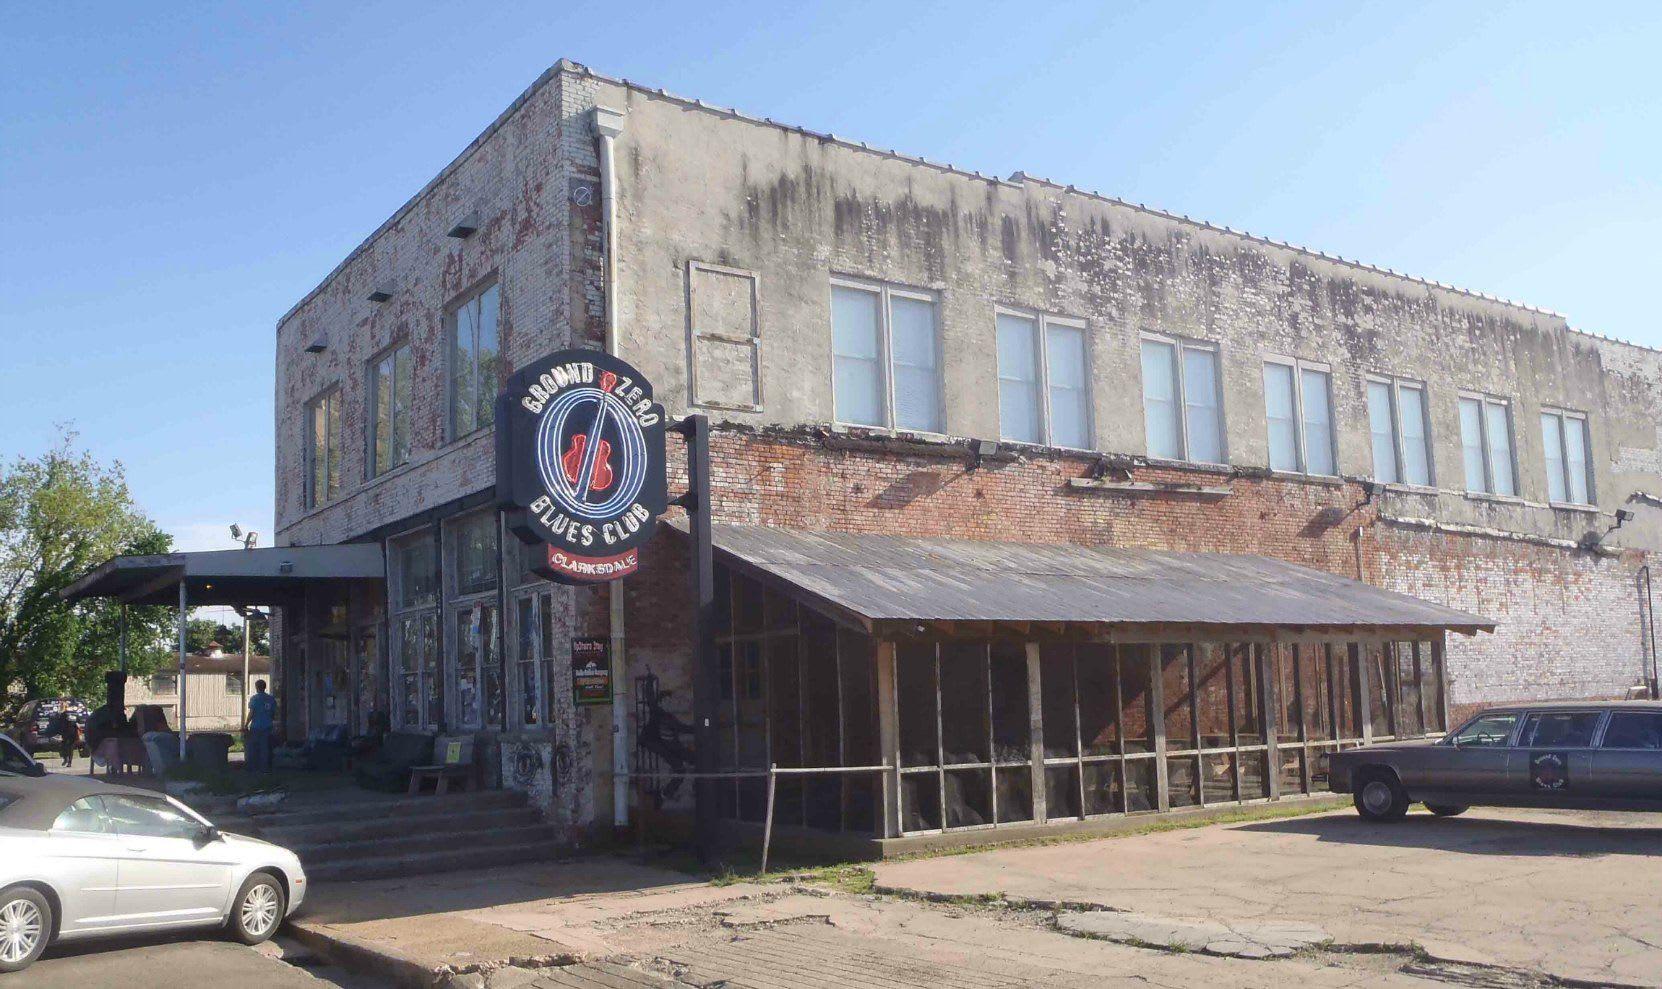 Ground Zero blues club owned by Morgan Freeman